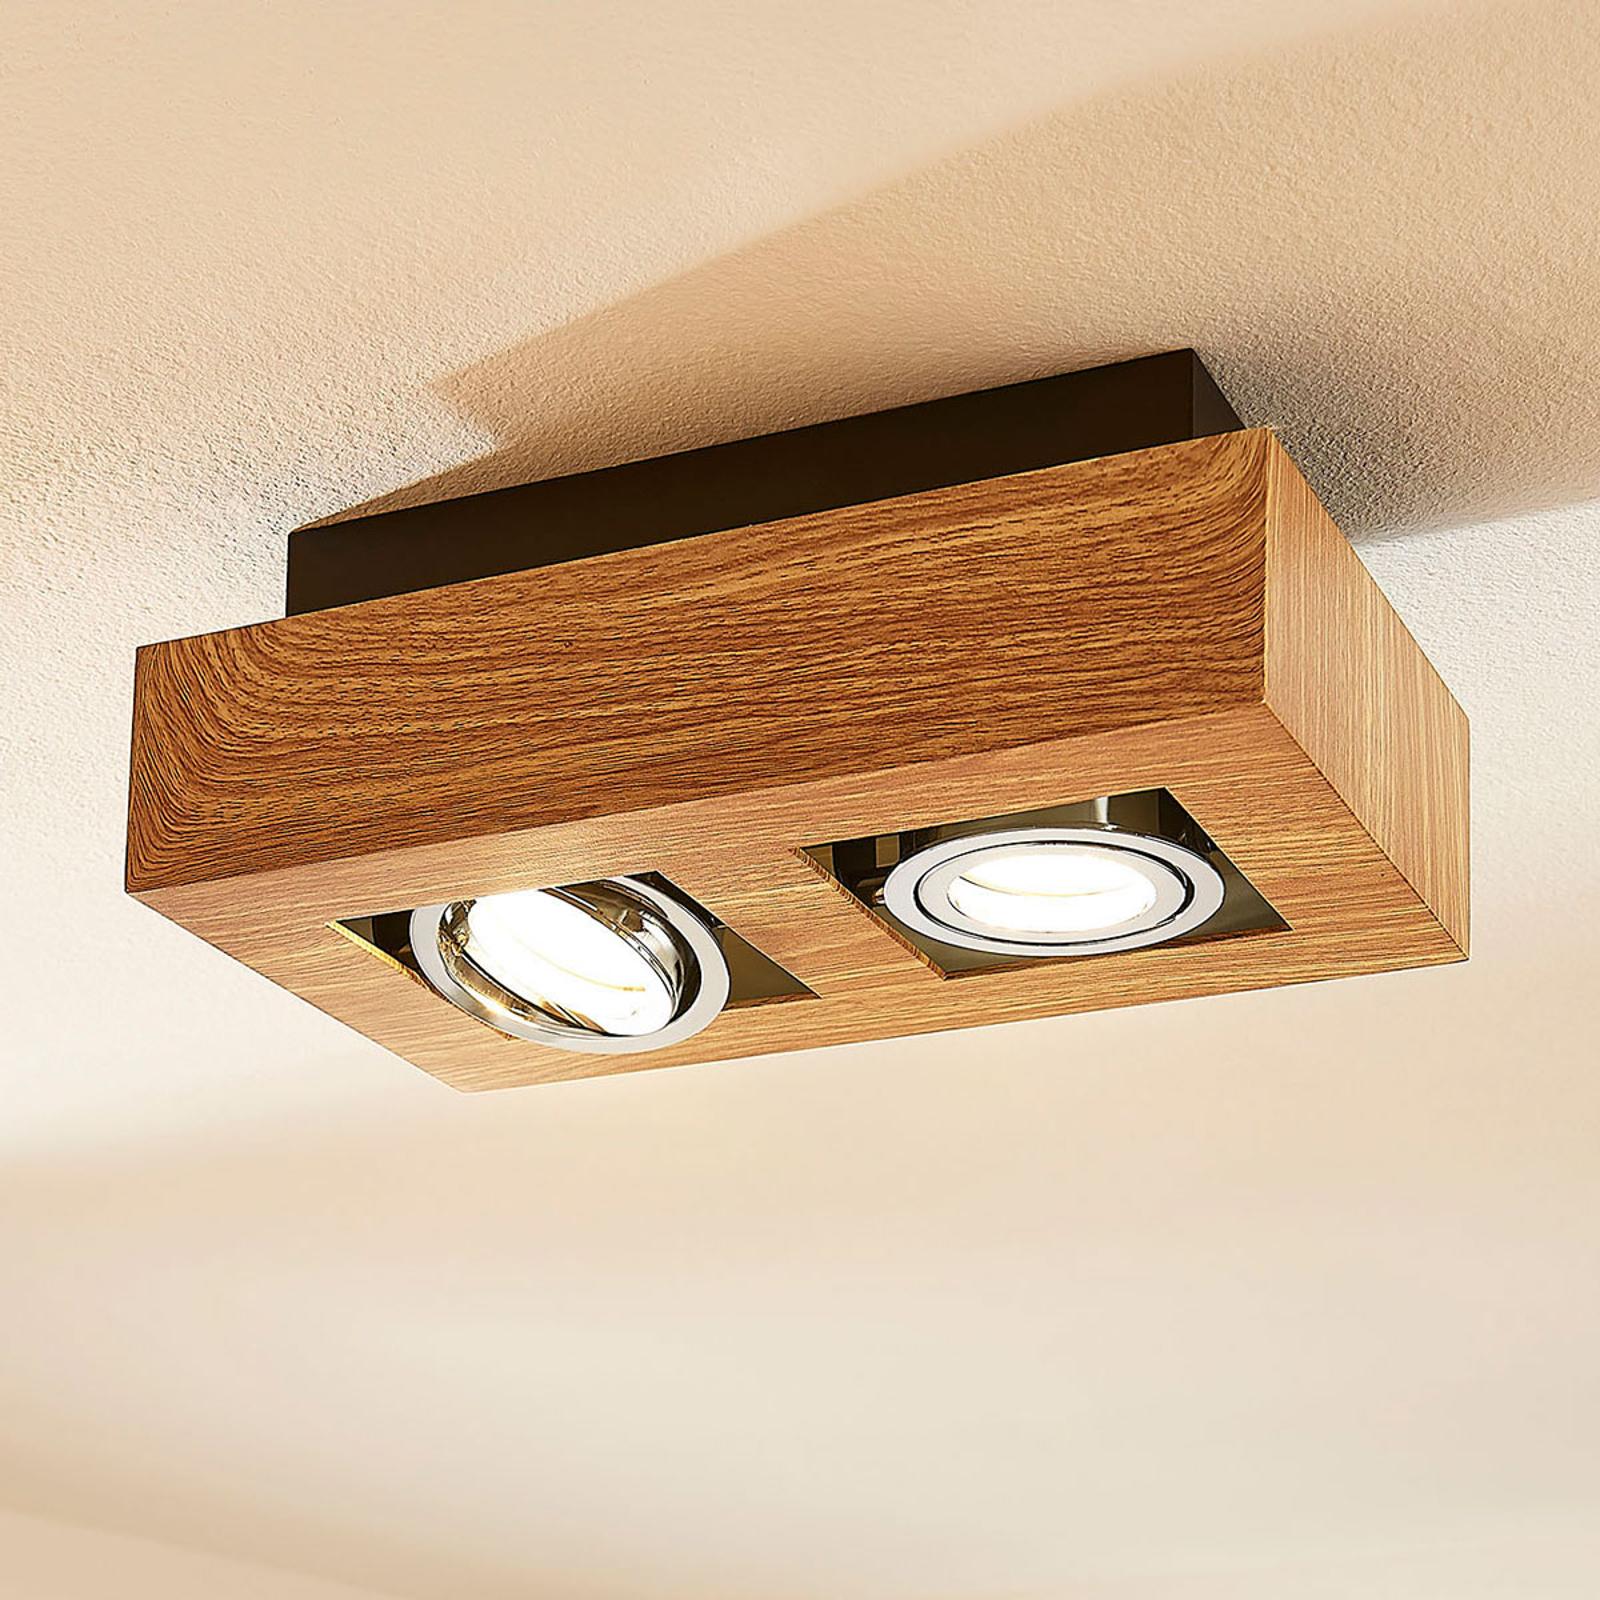 LED-kattolamppu Vince, 25 x 14 cm puuta